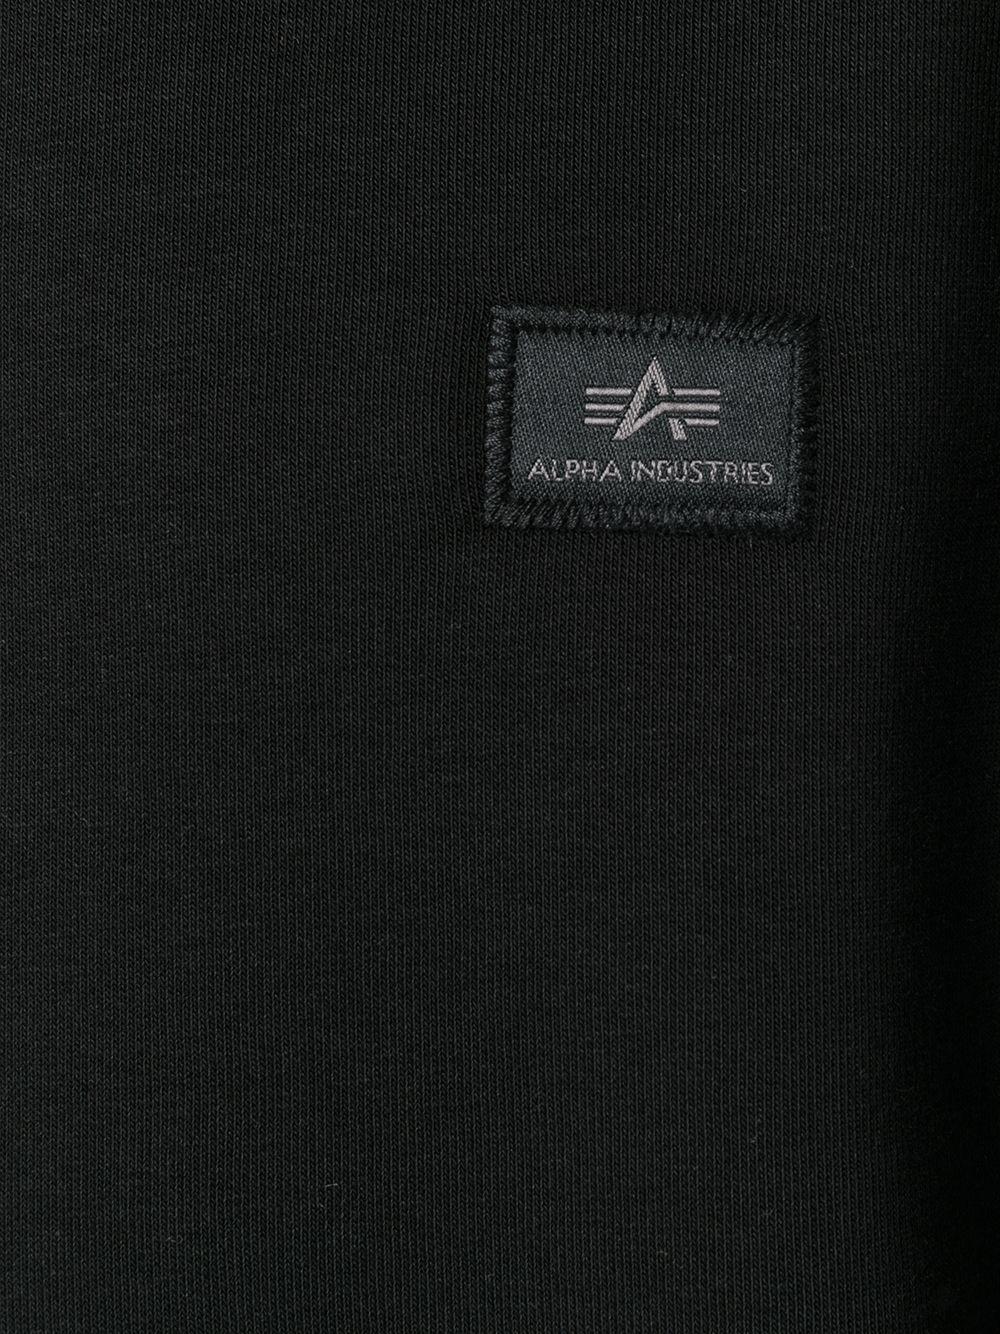 felpa a girocollo uomo nera in cotone ALPHA INDUSTRIES | Felpe | 15832003